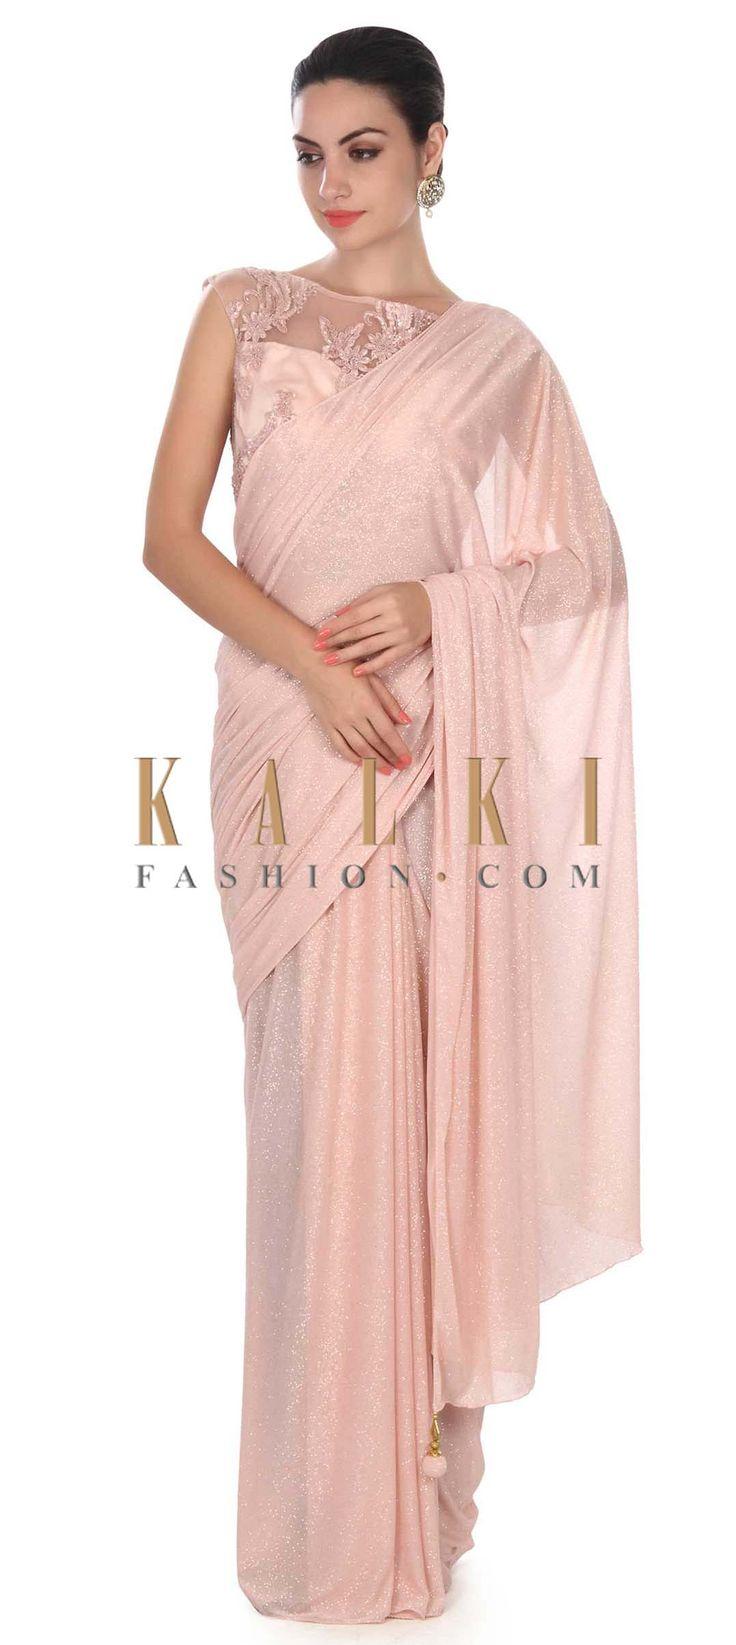 The 25 best Sari hindú images on Pinterest | Indian clothes, Saree ...